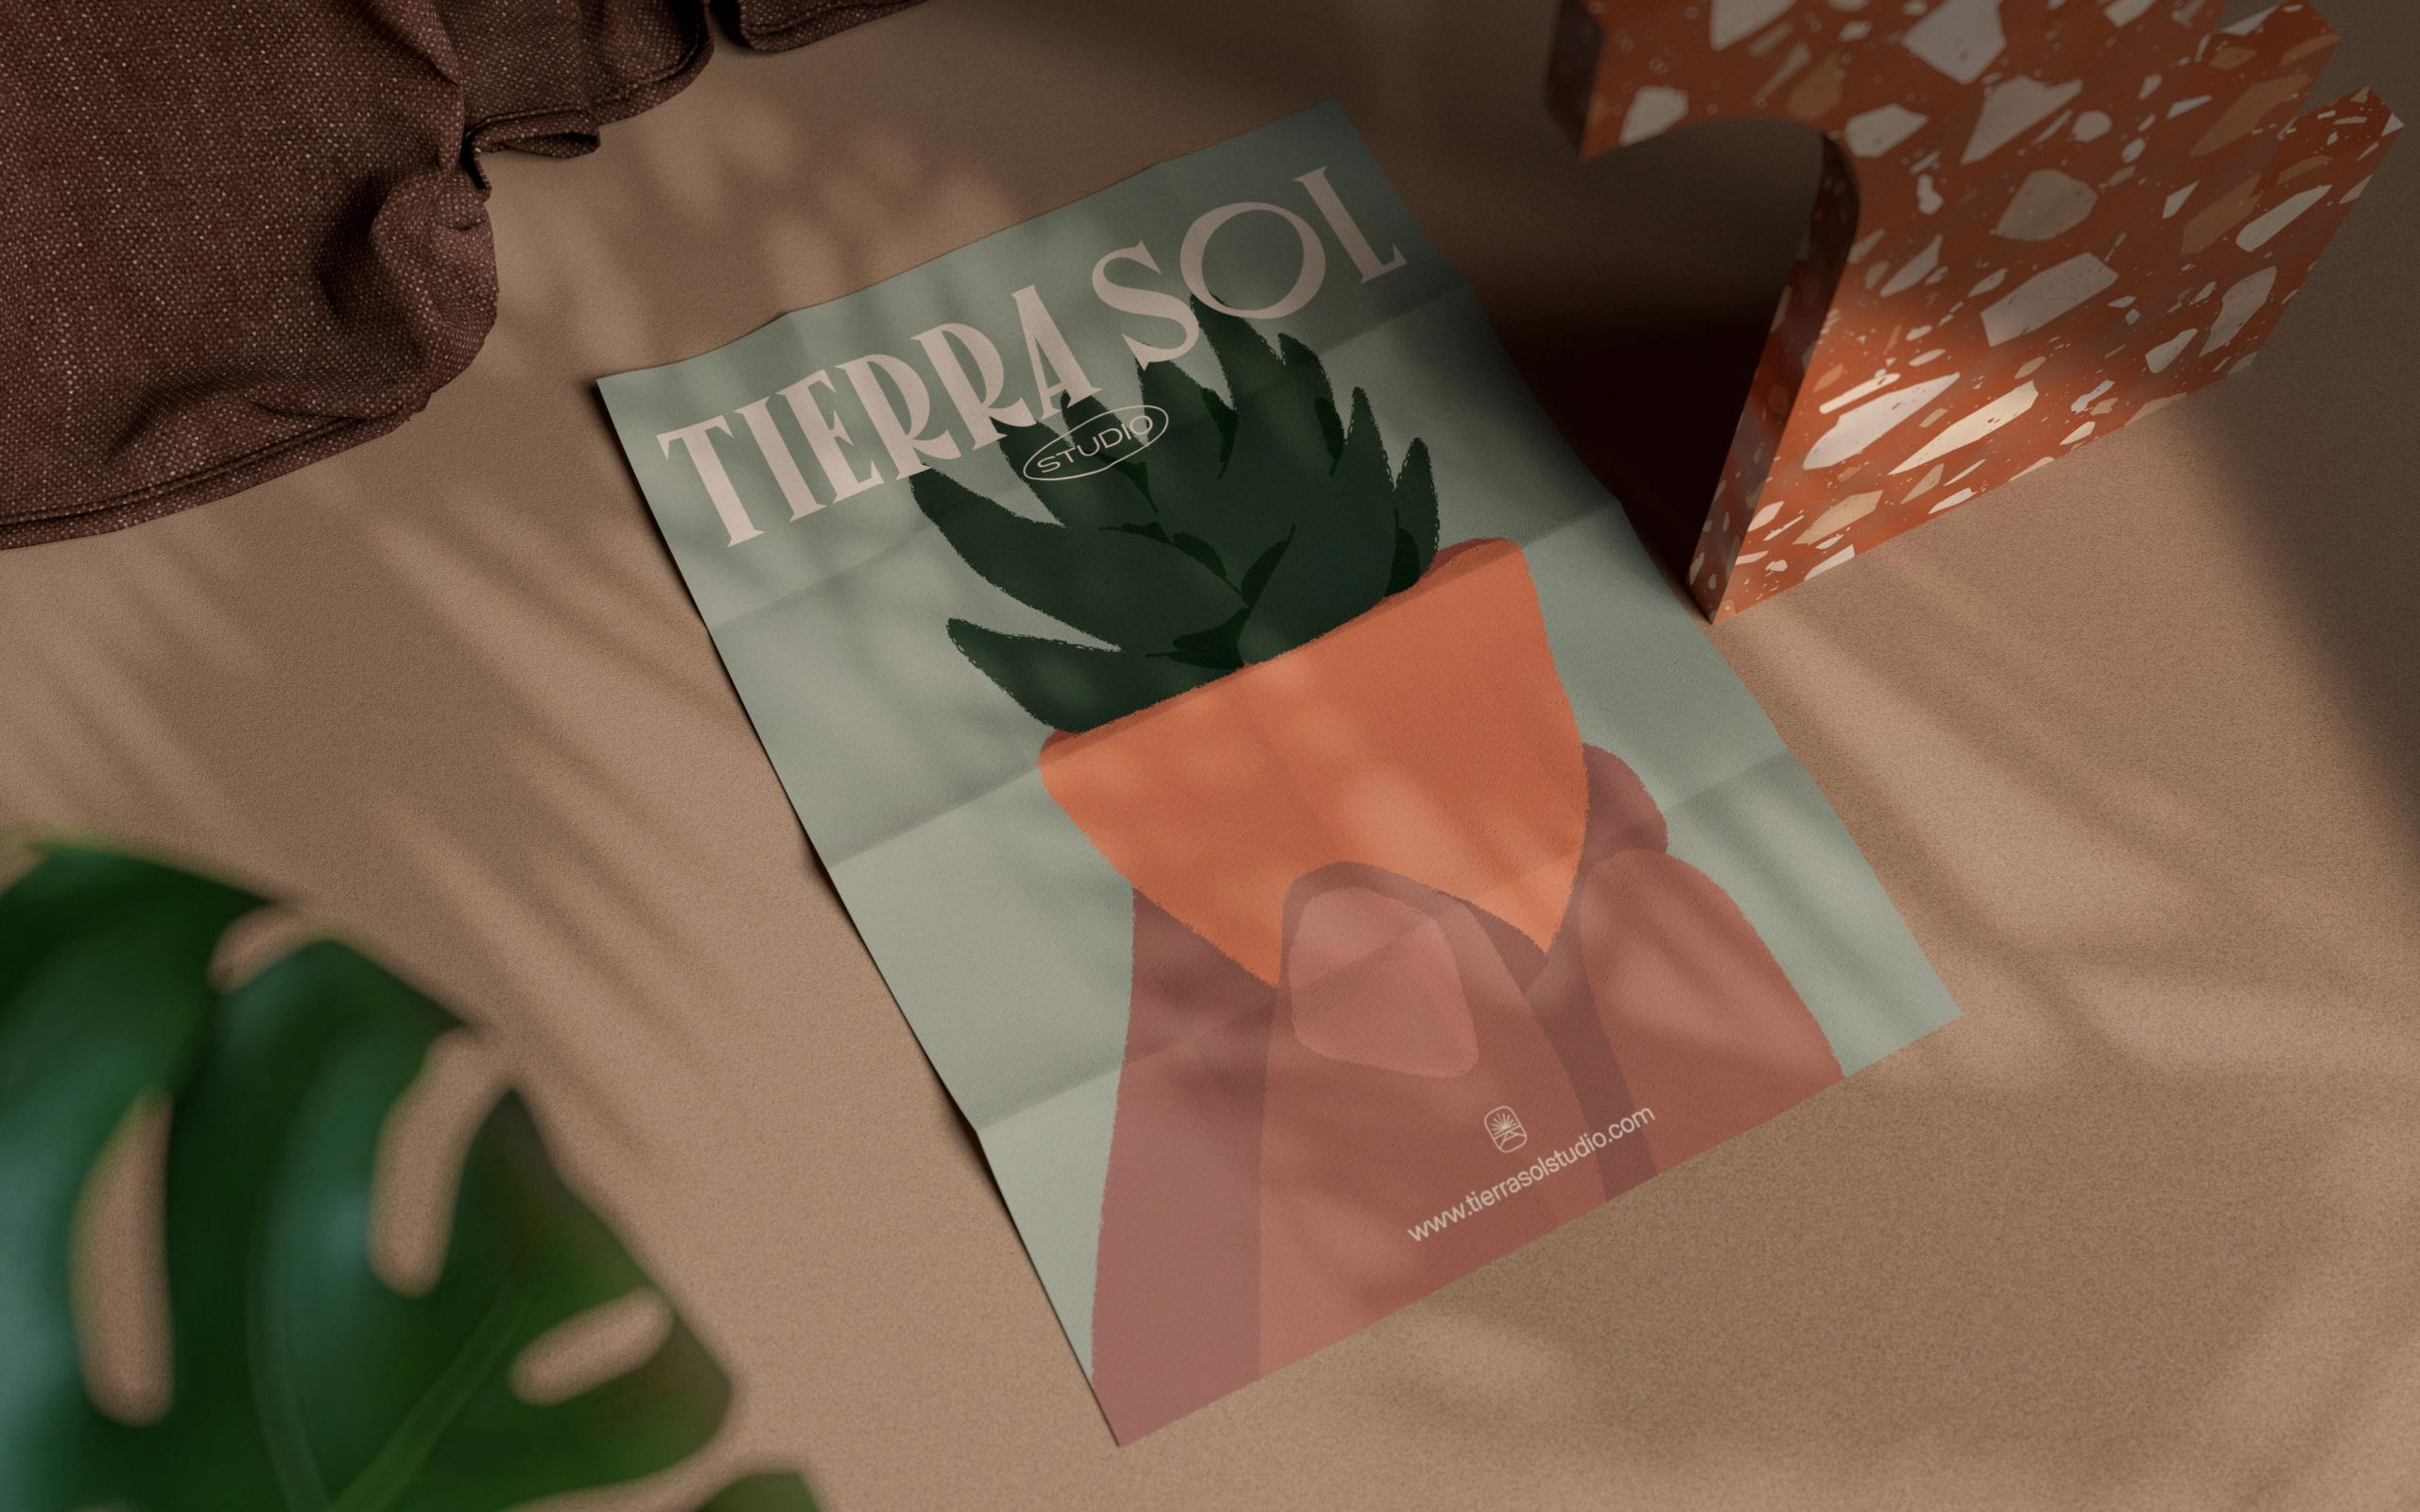 Tierra-Sol-07